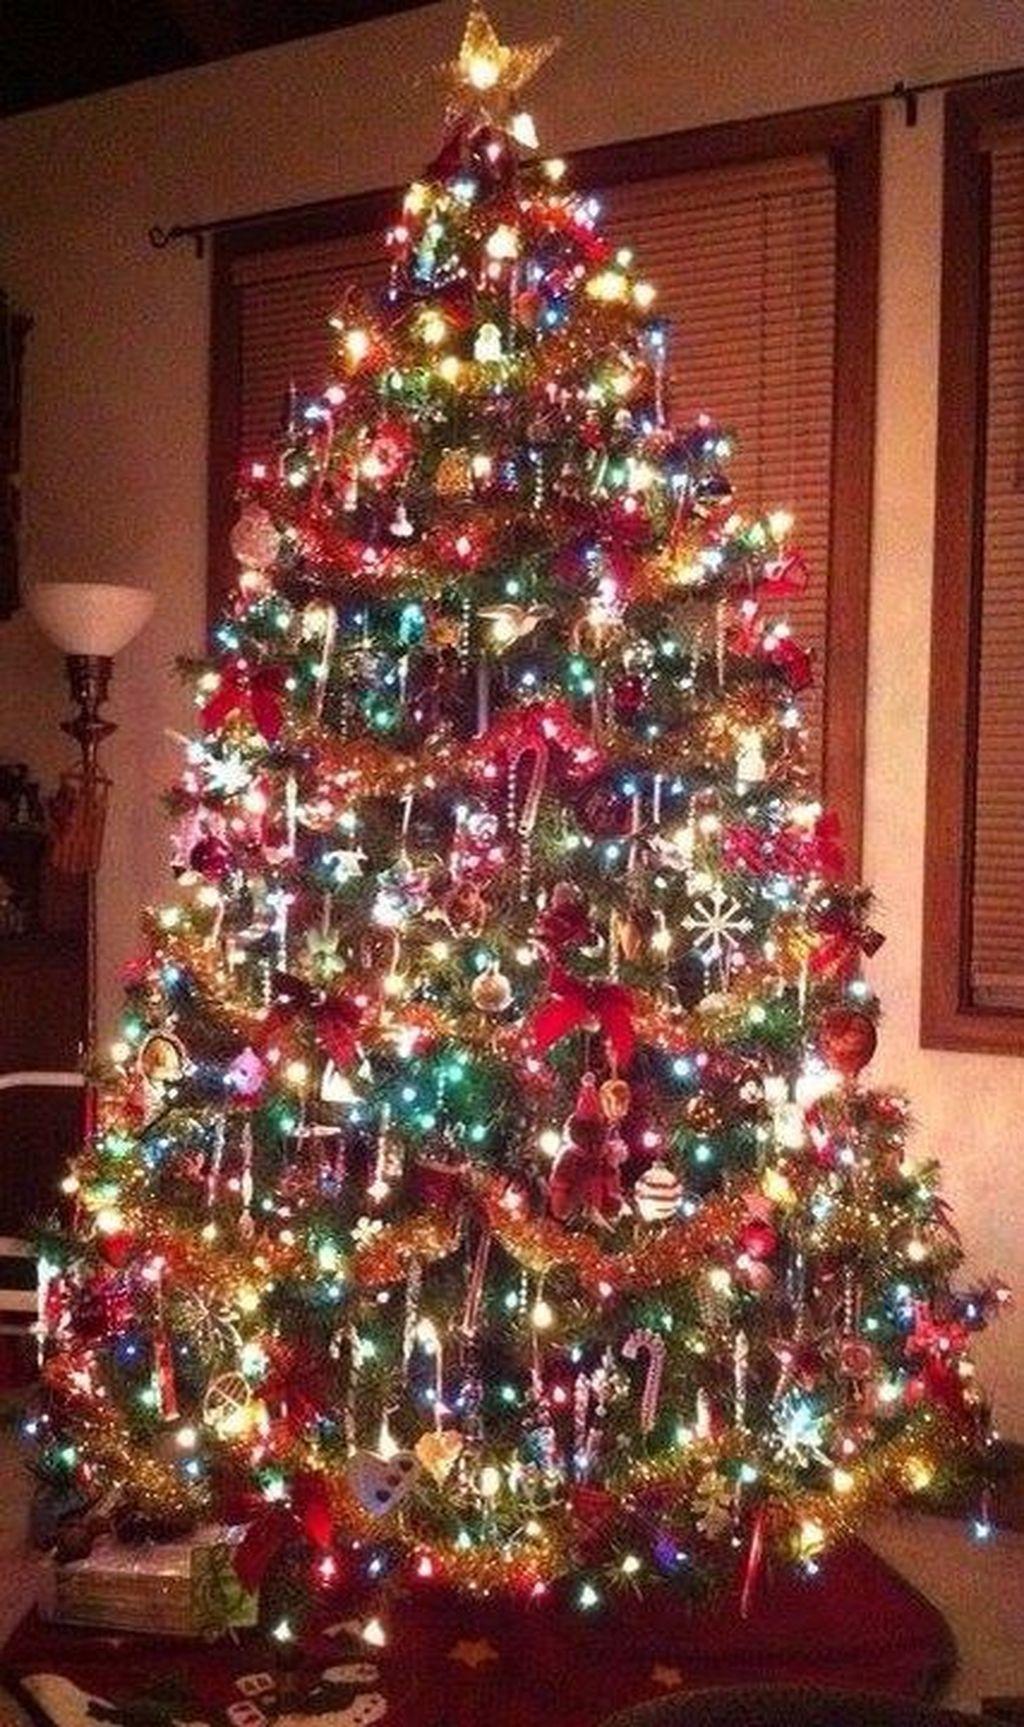 42 Amazing Christmas Lights Tree Decoration Ideas Pimphomee Christmas Tree Christmas Lights Vintage Christmas Tree